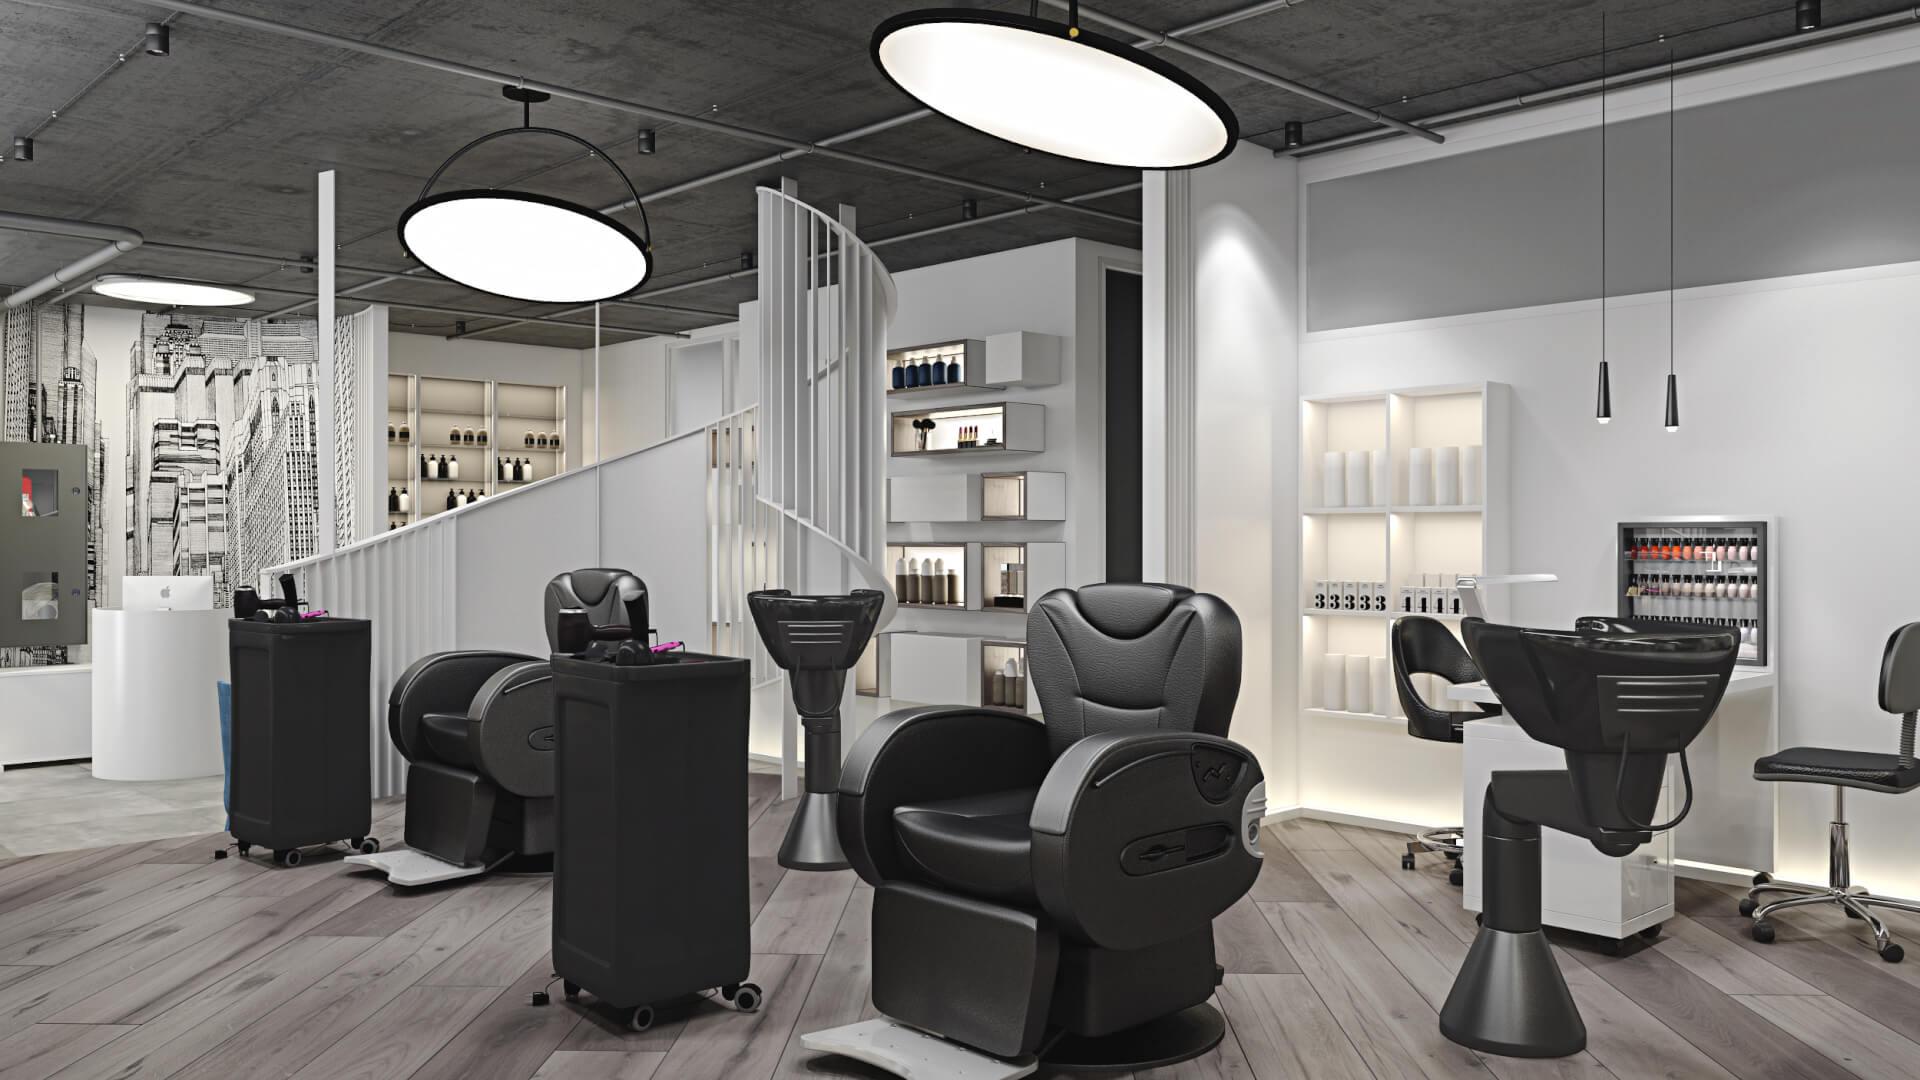 Salon_Bulvar_Fontanov_KN_01_View070007